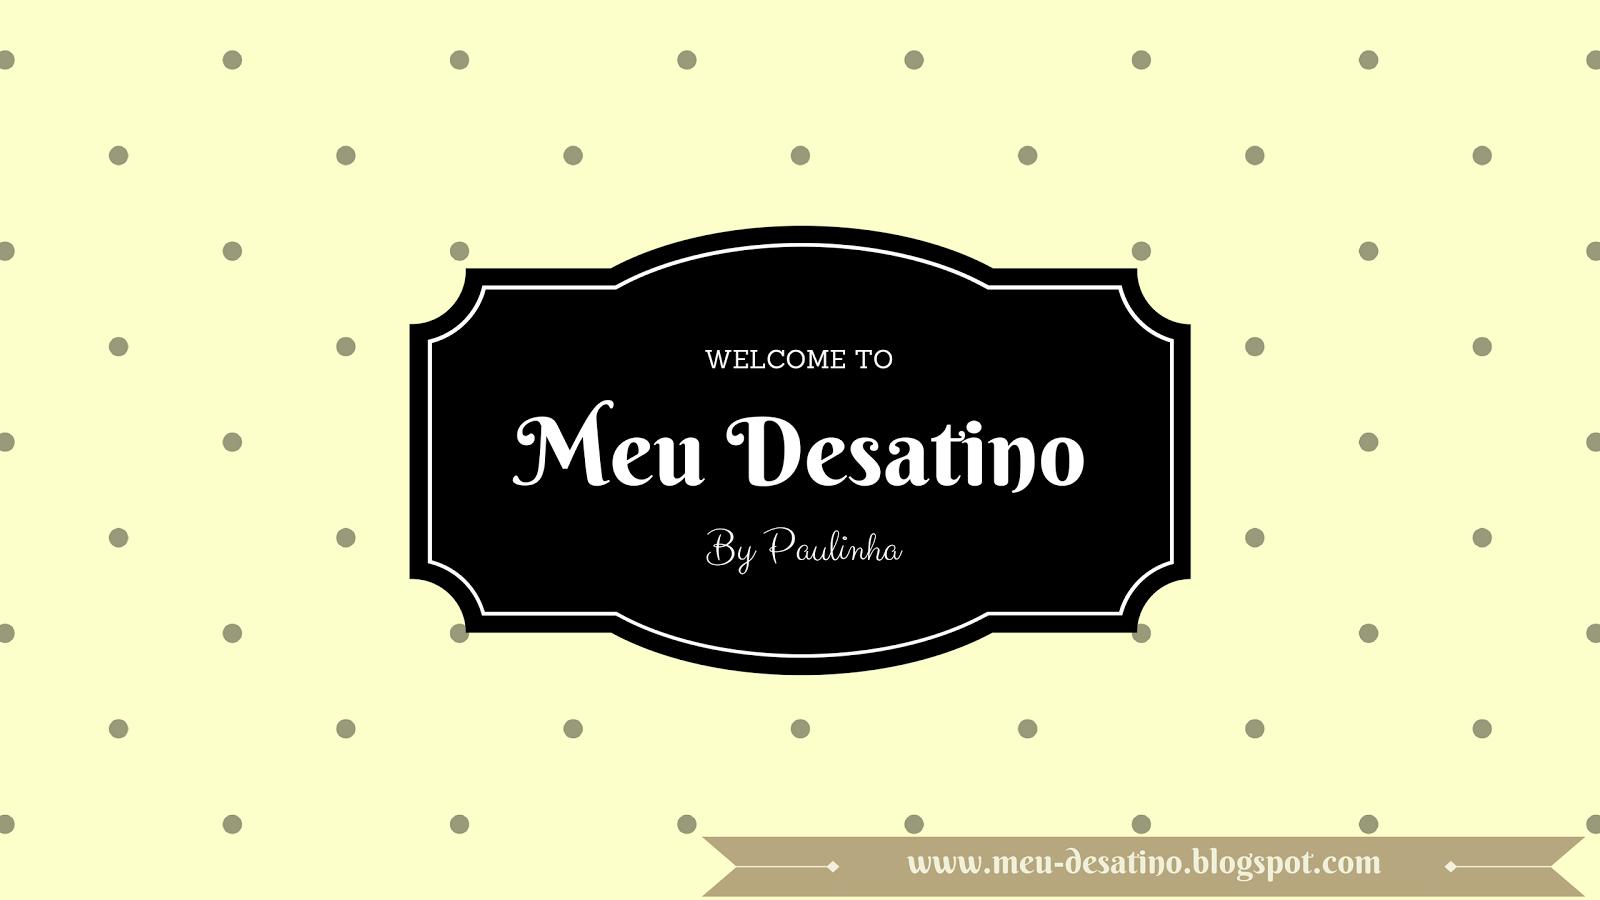 ◘ Blog da Paulinha ◘